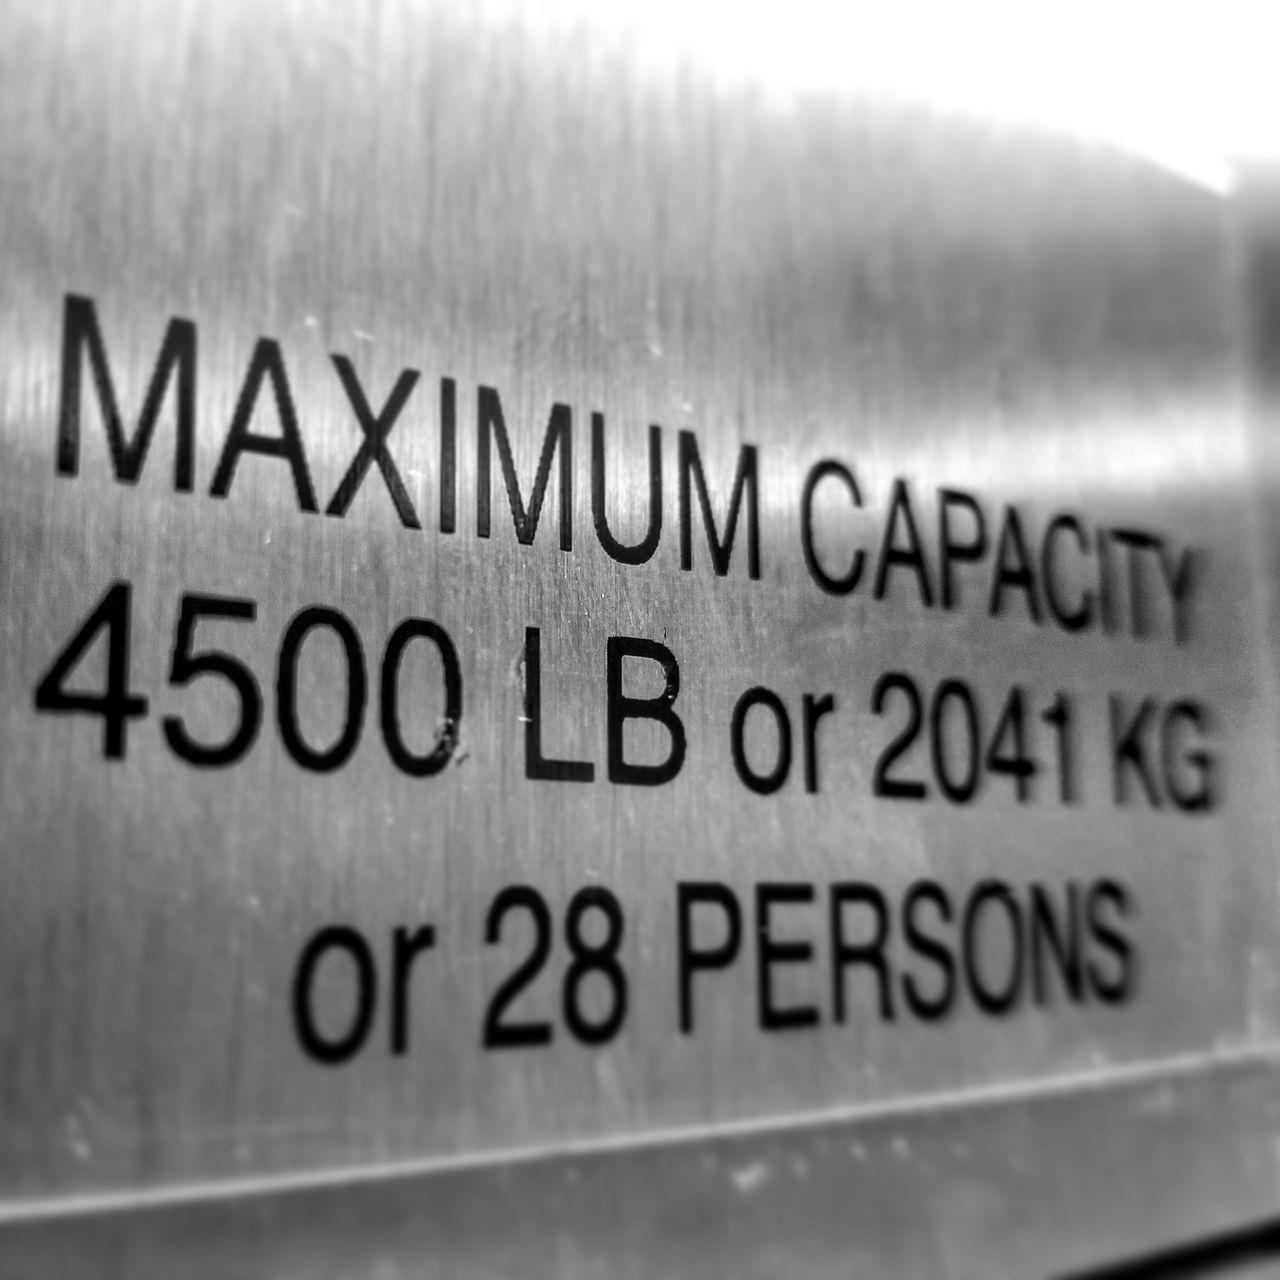 Close-up No People Indoors  Black And White Storage Space Elevator Space Storage Buildings Elevator Door Maximum Capacity Reached